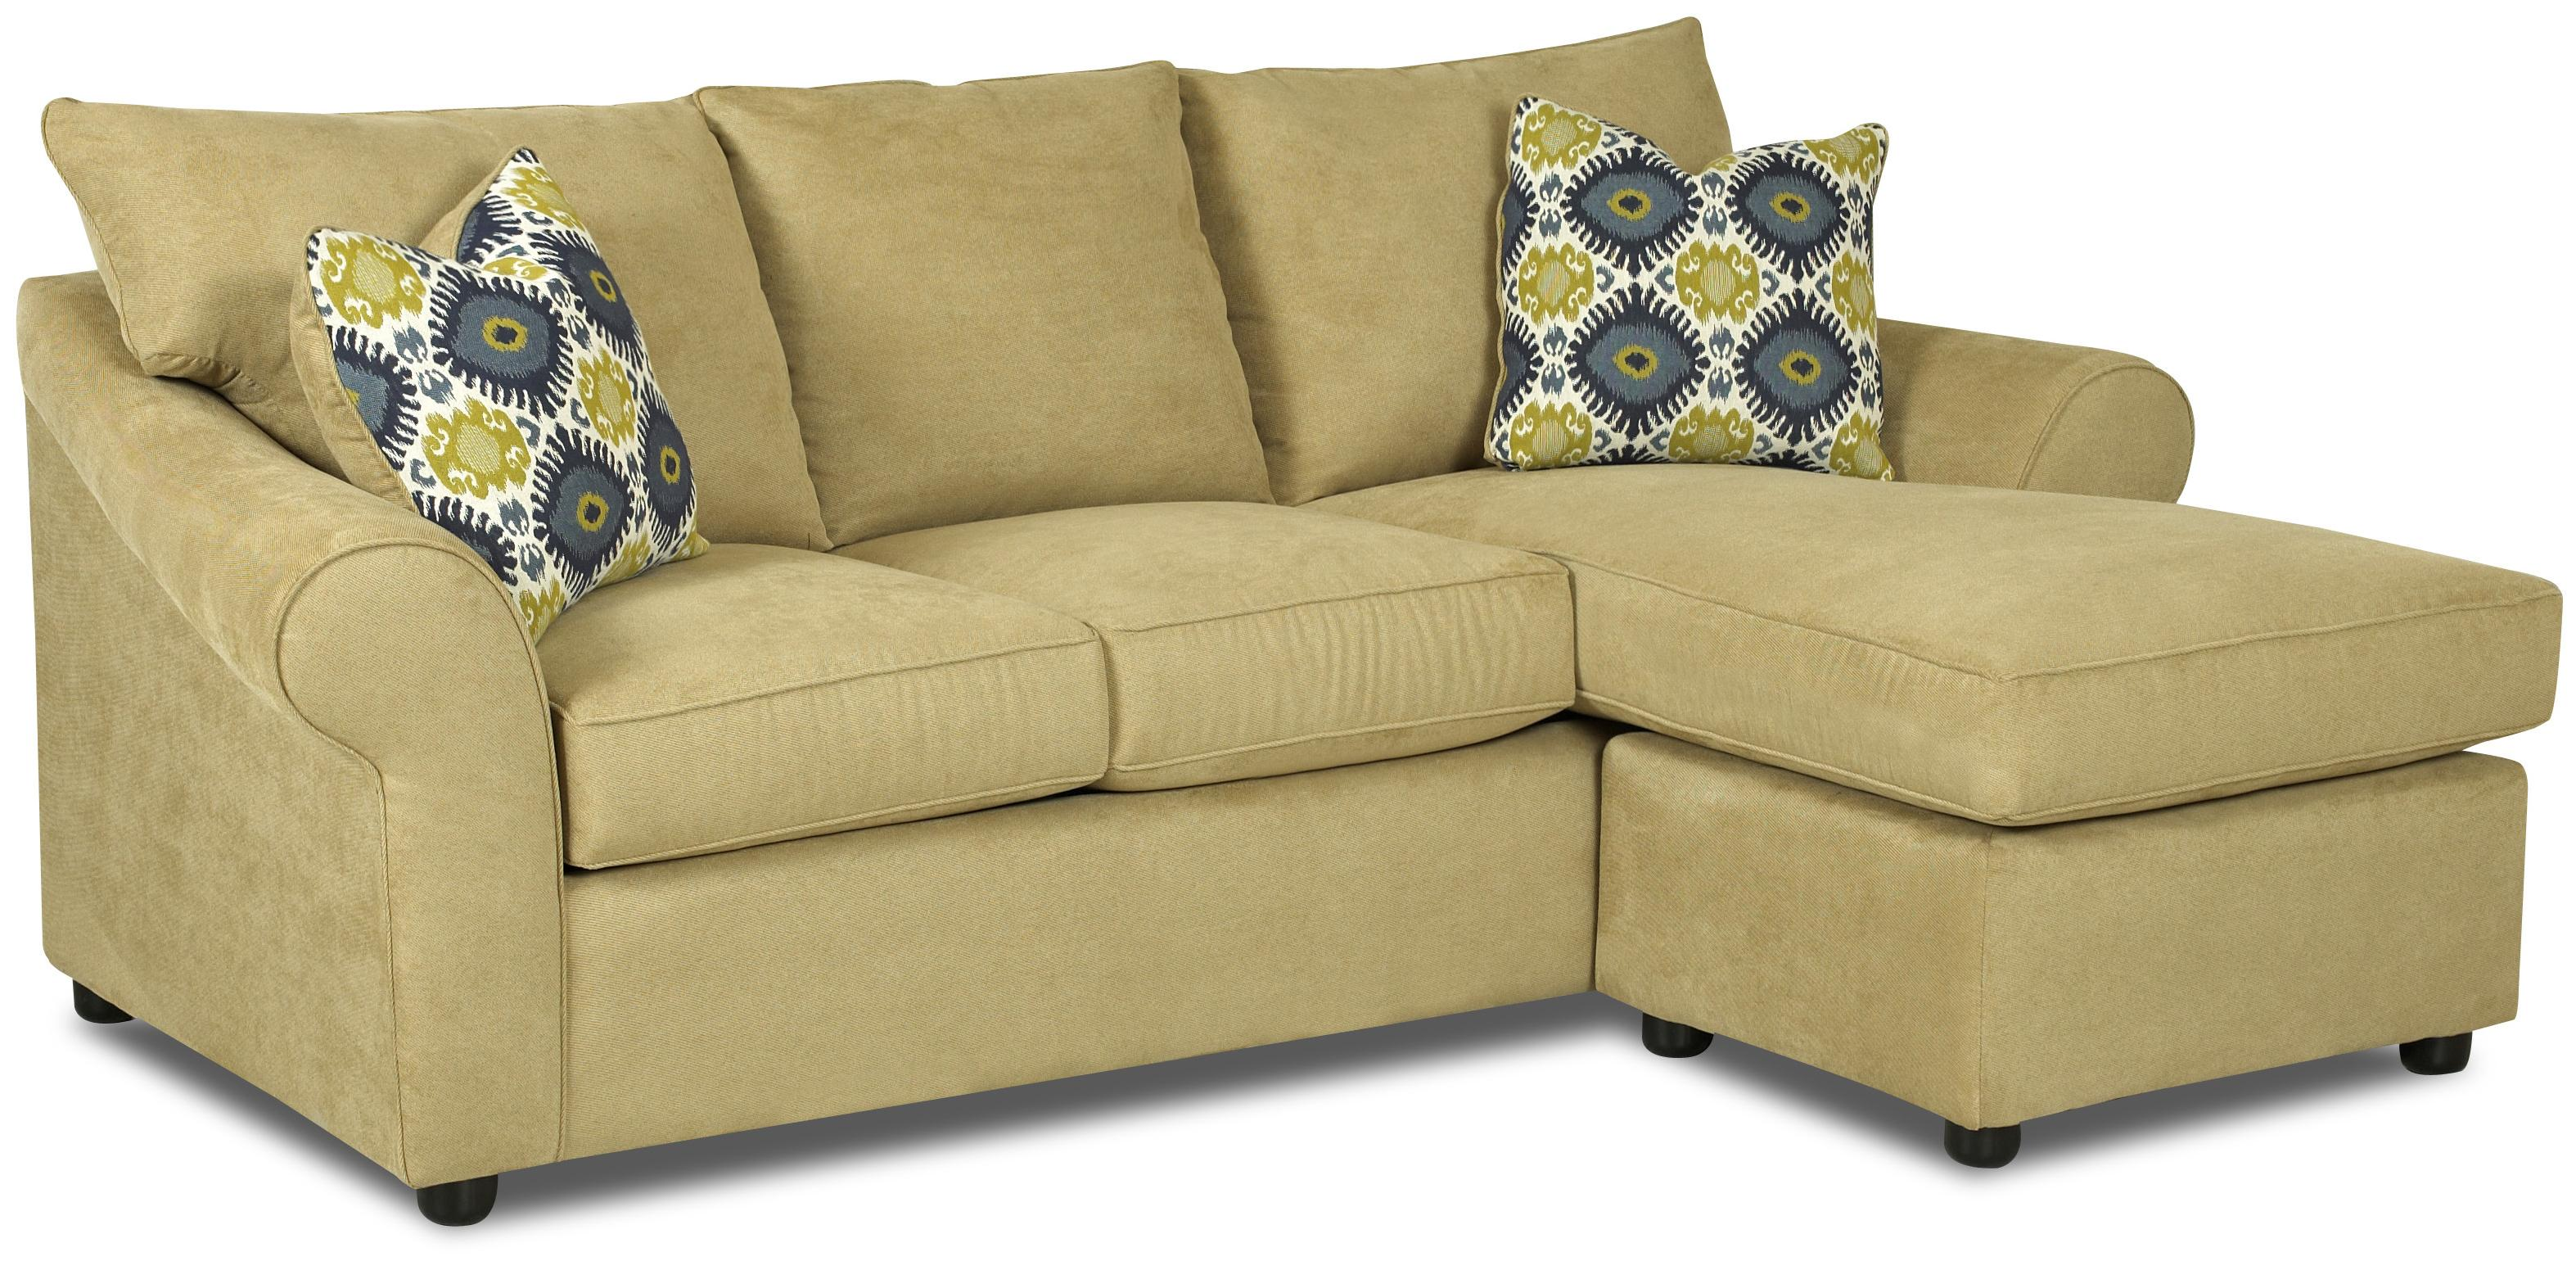 chaise lounge sofa klaussner folio sofa chaise - item number: e34300 s + b otch ZLSNPRW